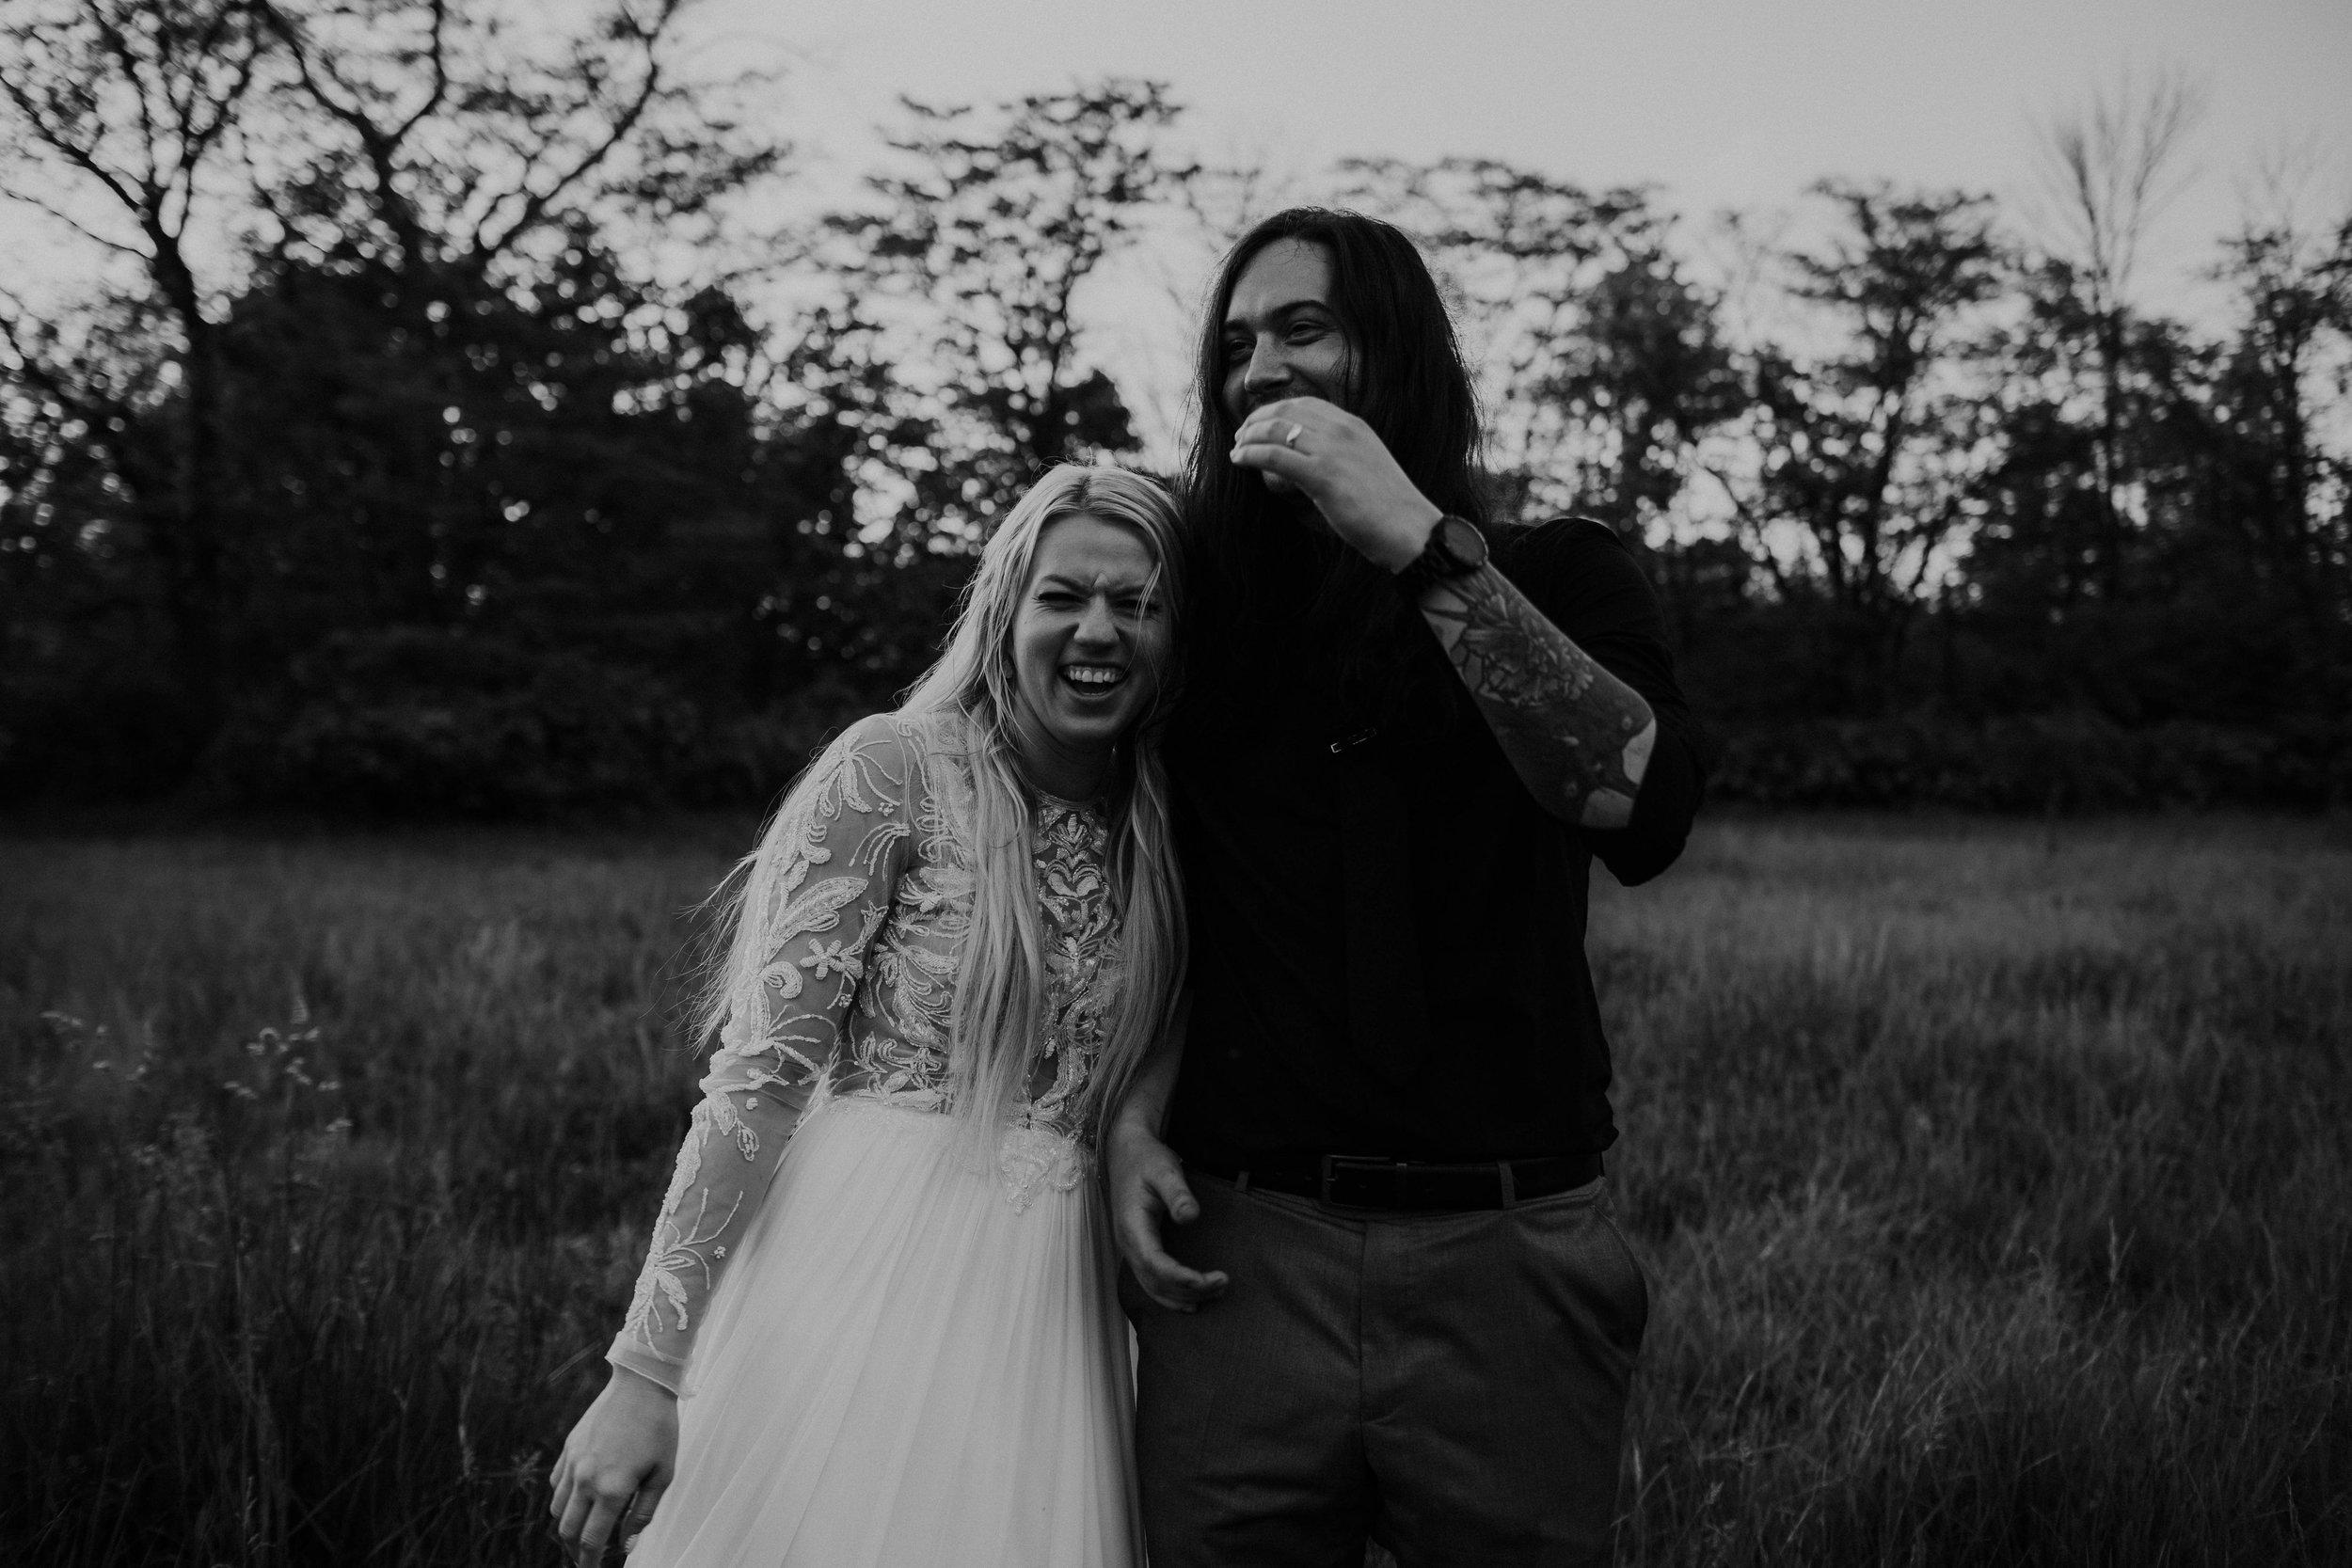 Columbus ohio wedding photographer canyon run ranch wedding grace e jones photography wedding photographer196.jpg